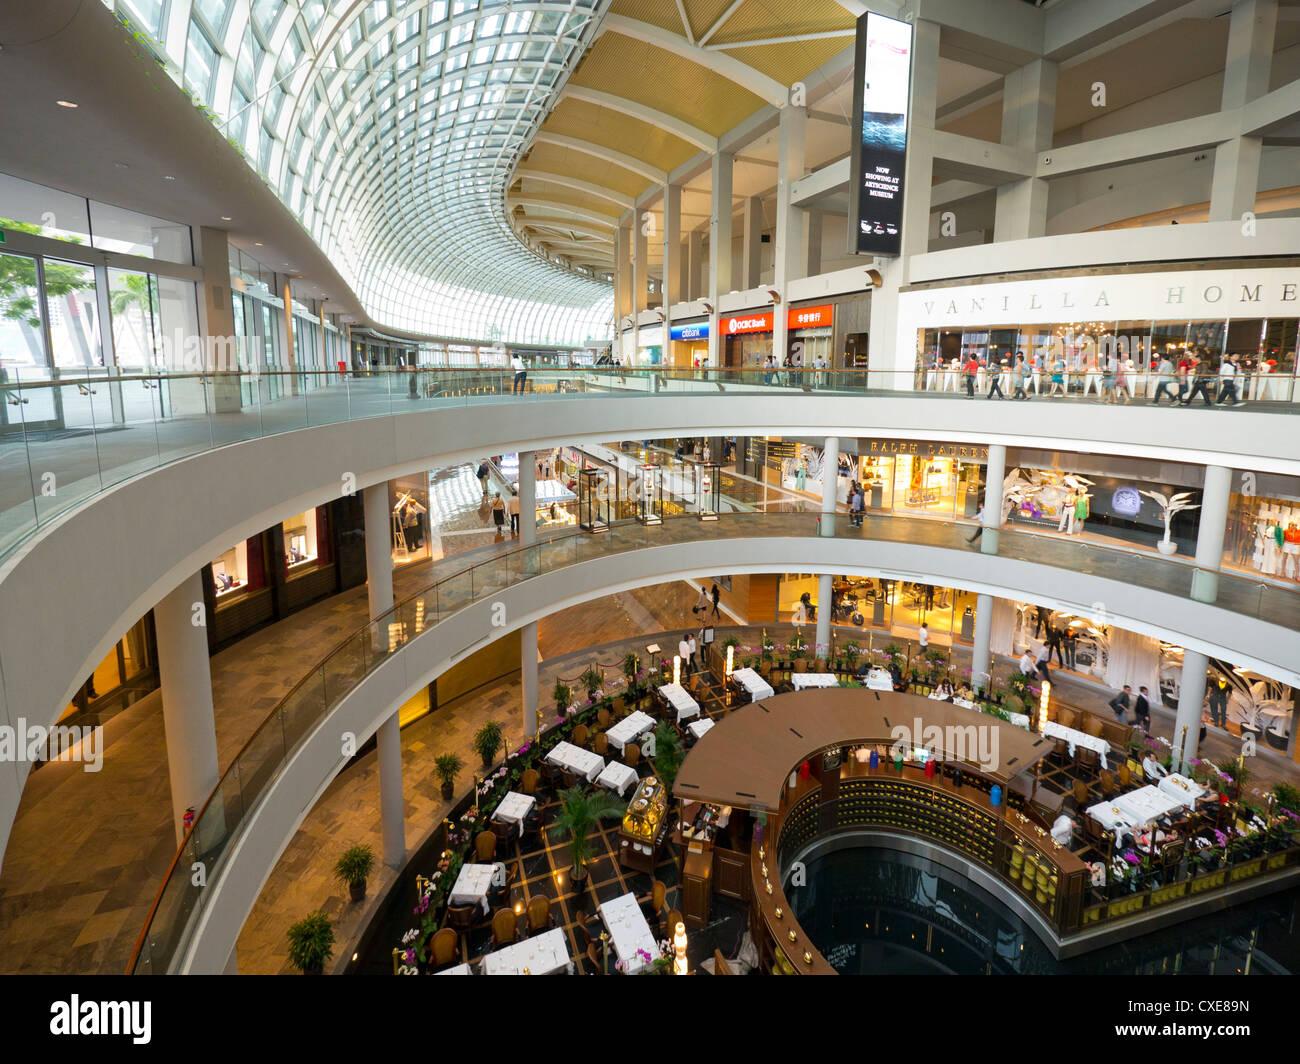 Marina Bay Sands Shopping Mall, Singapore, Asia - Stock Image